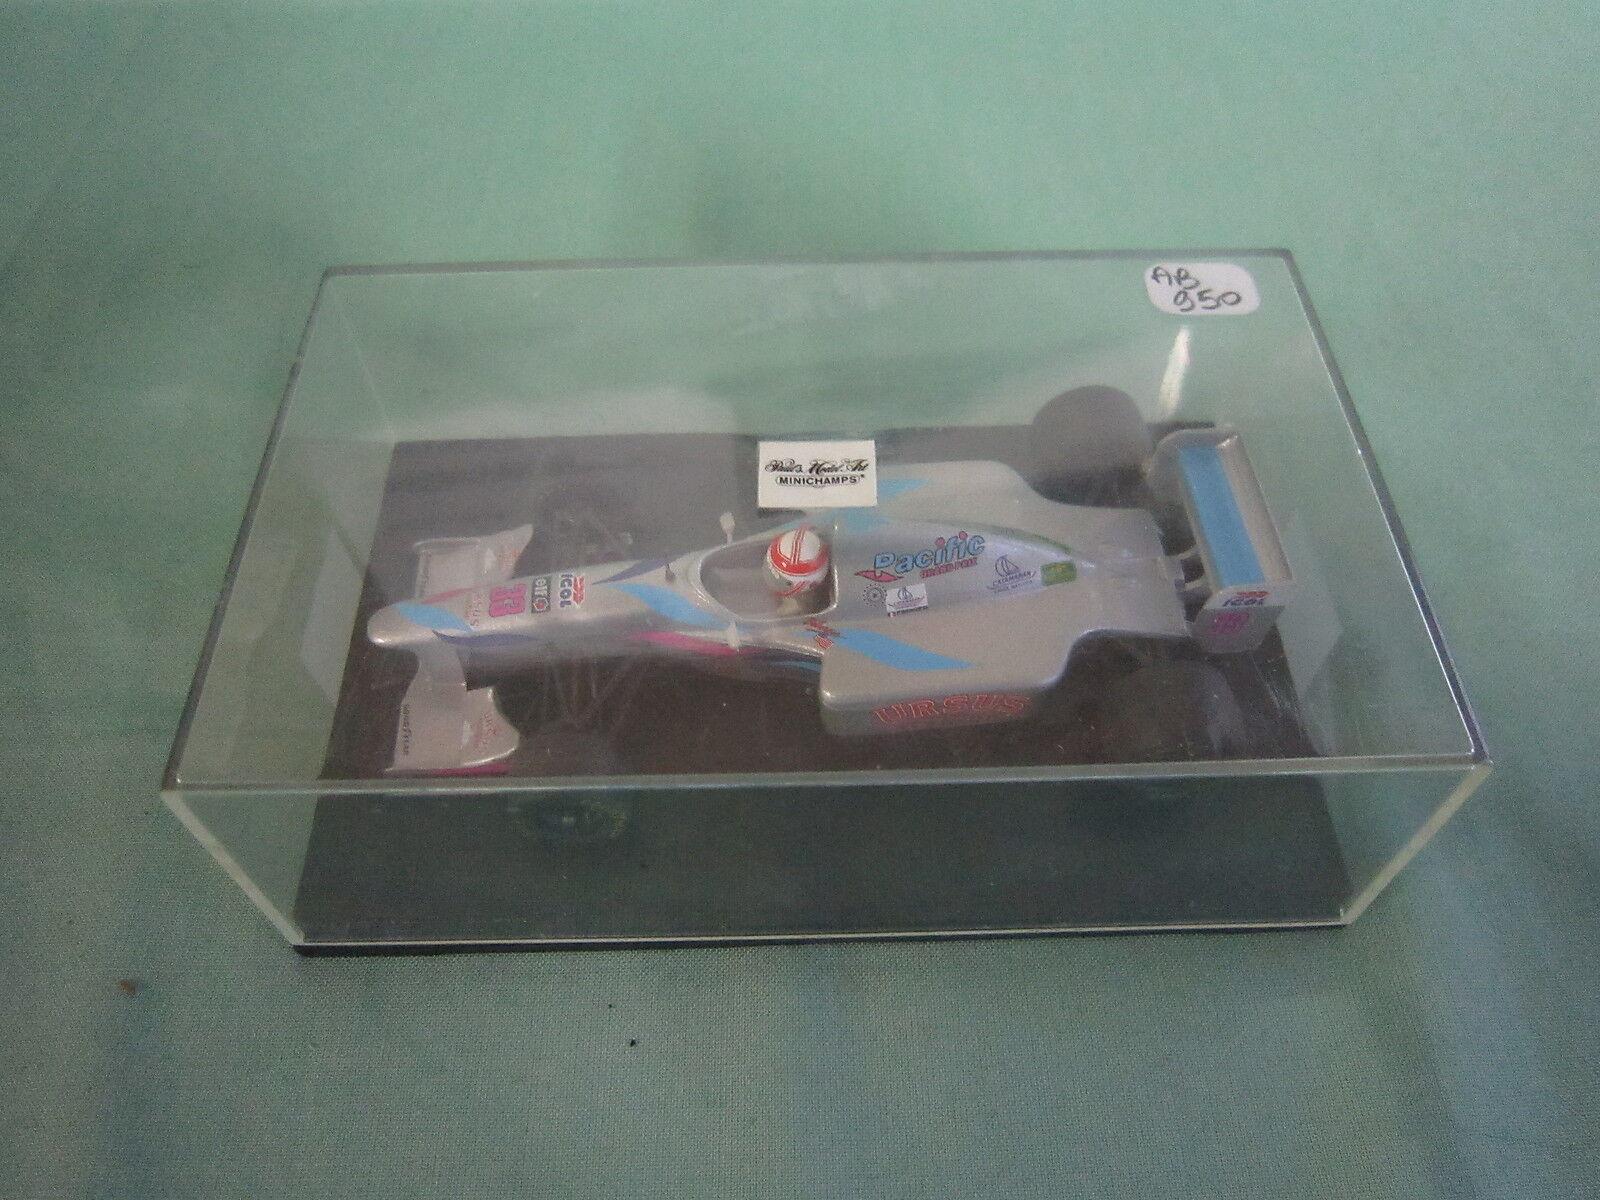 AB950 ONYX PACIFIC ILMOR pr 01 F1  33 Paul BELMONDO 1994 1 43